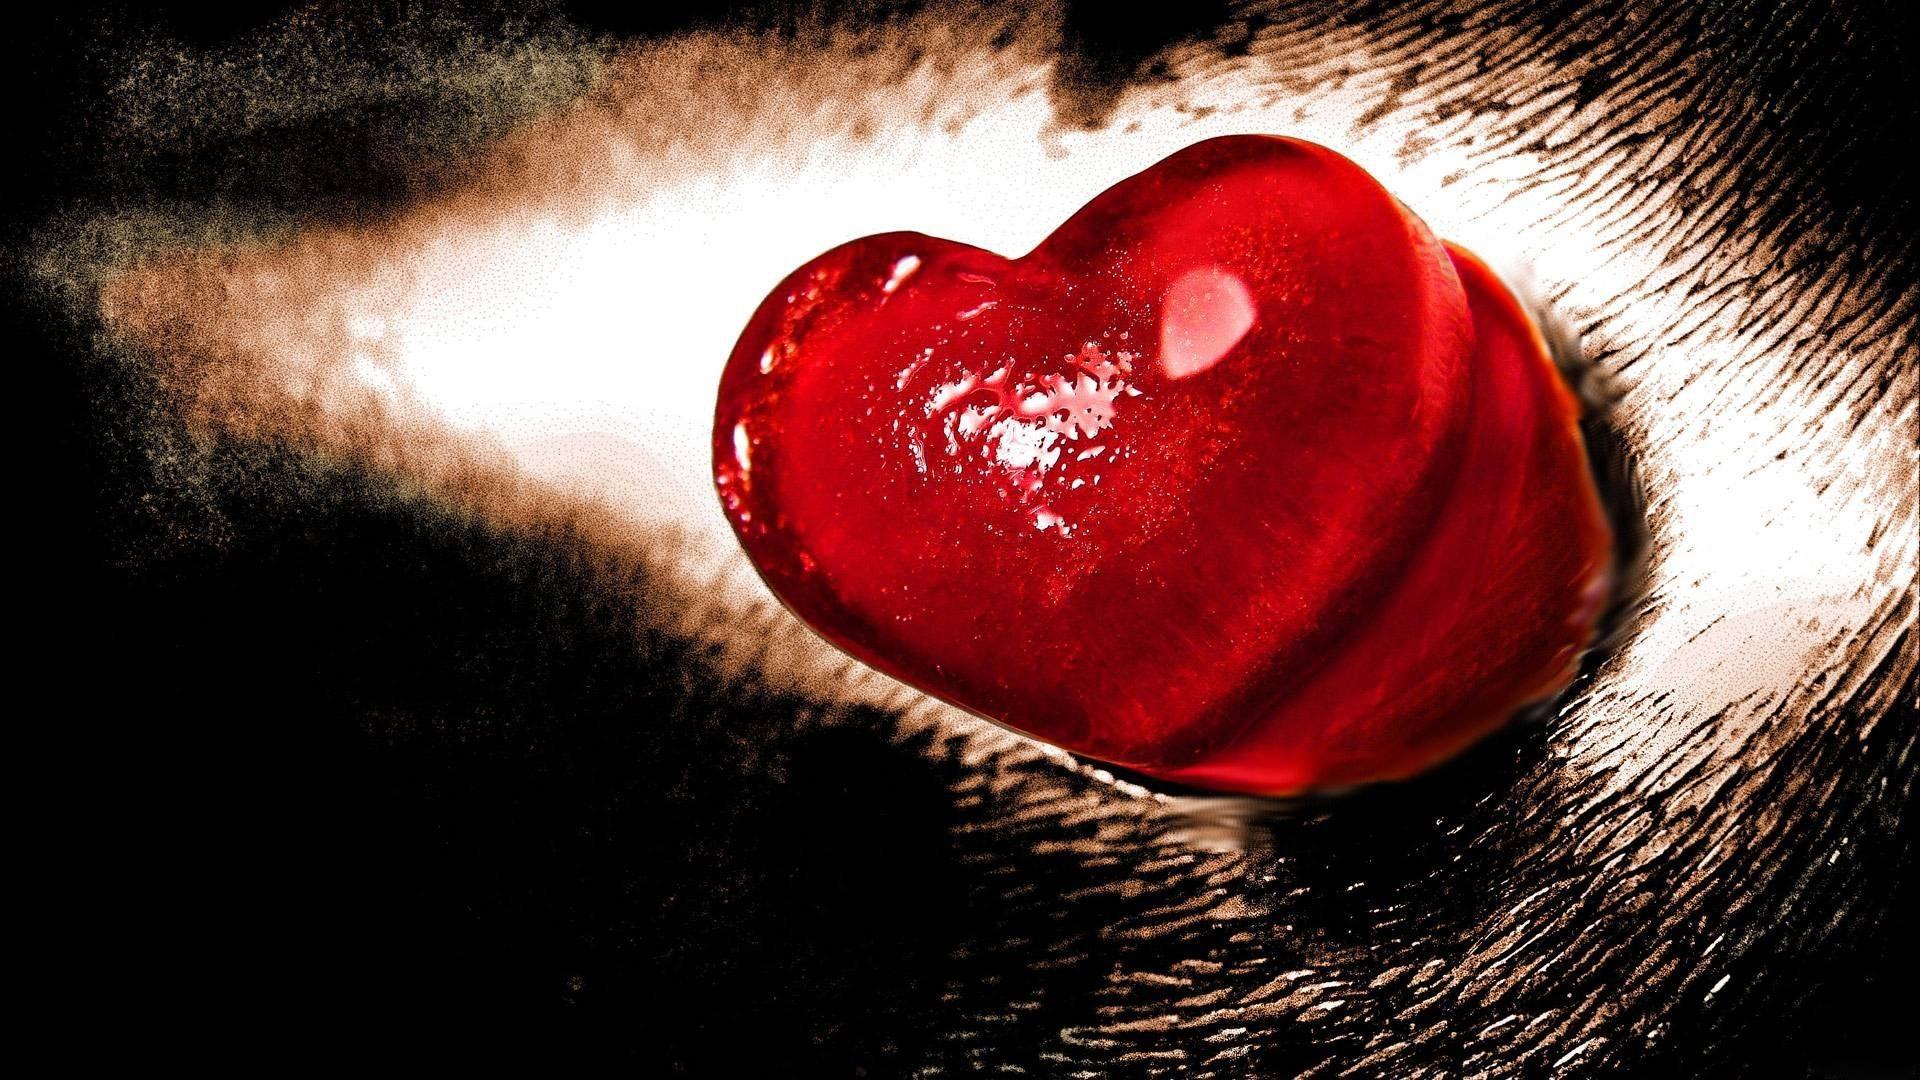 Love Wallpapers Hd Amor Fondos De Pantalla Love 3d: Love Heart Wallpaper HD ·① WallpaperTag